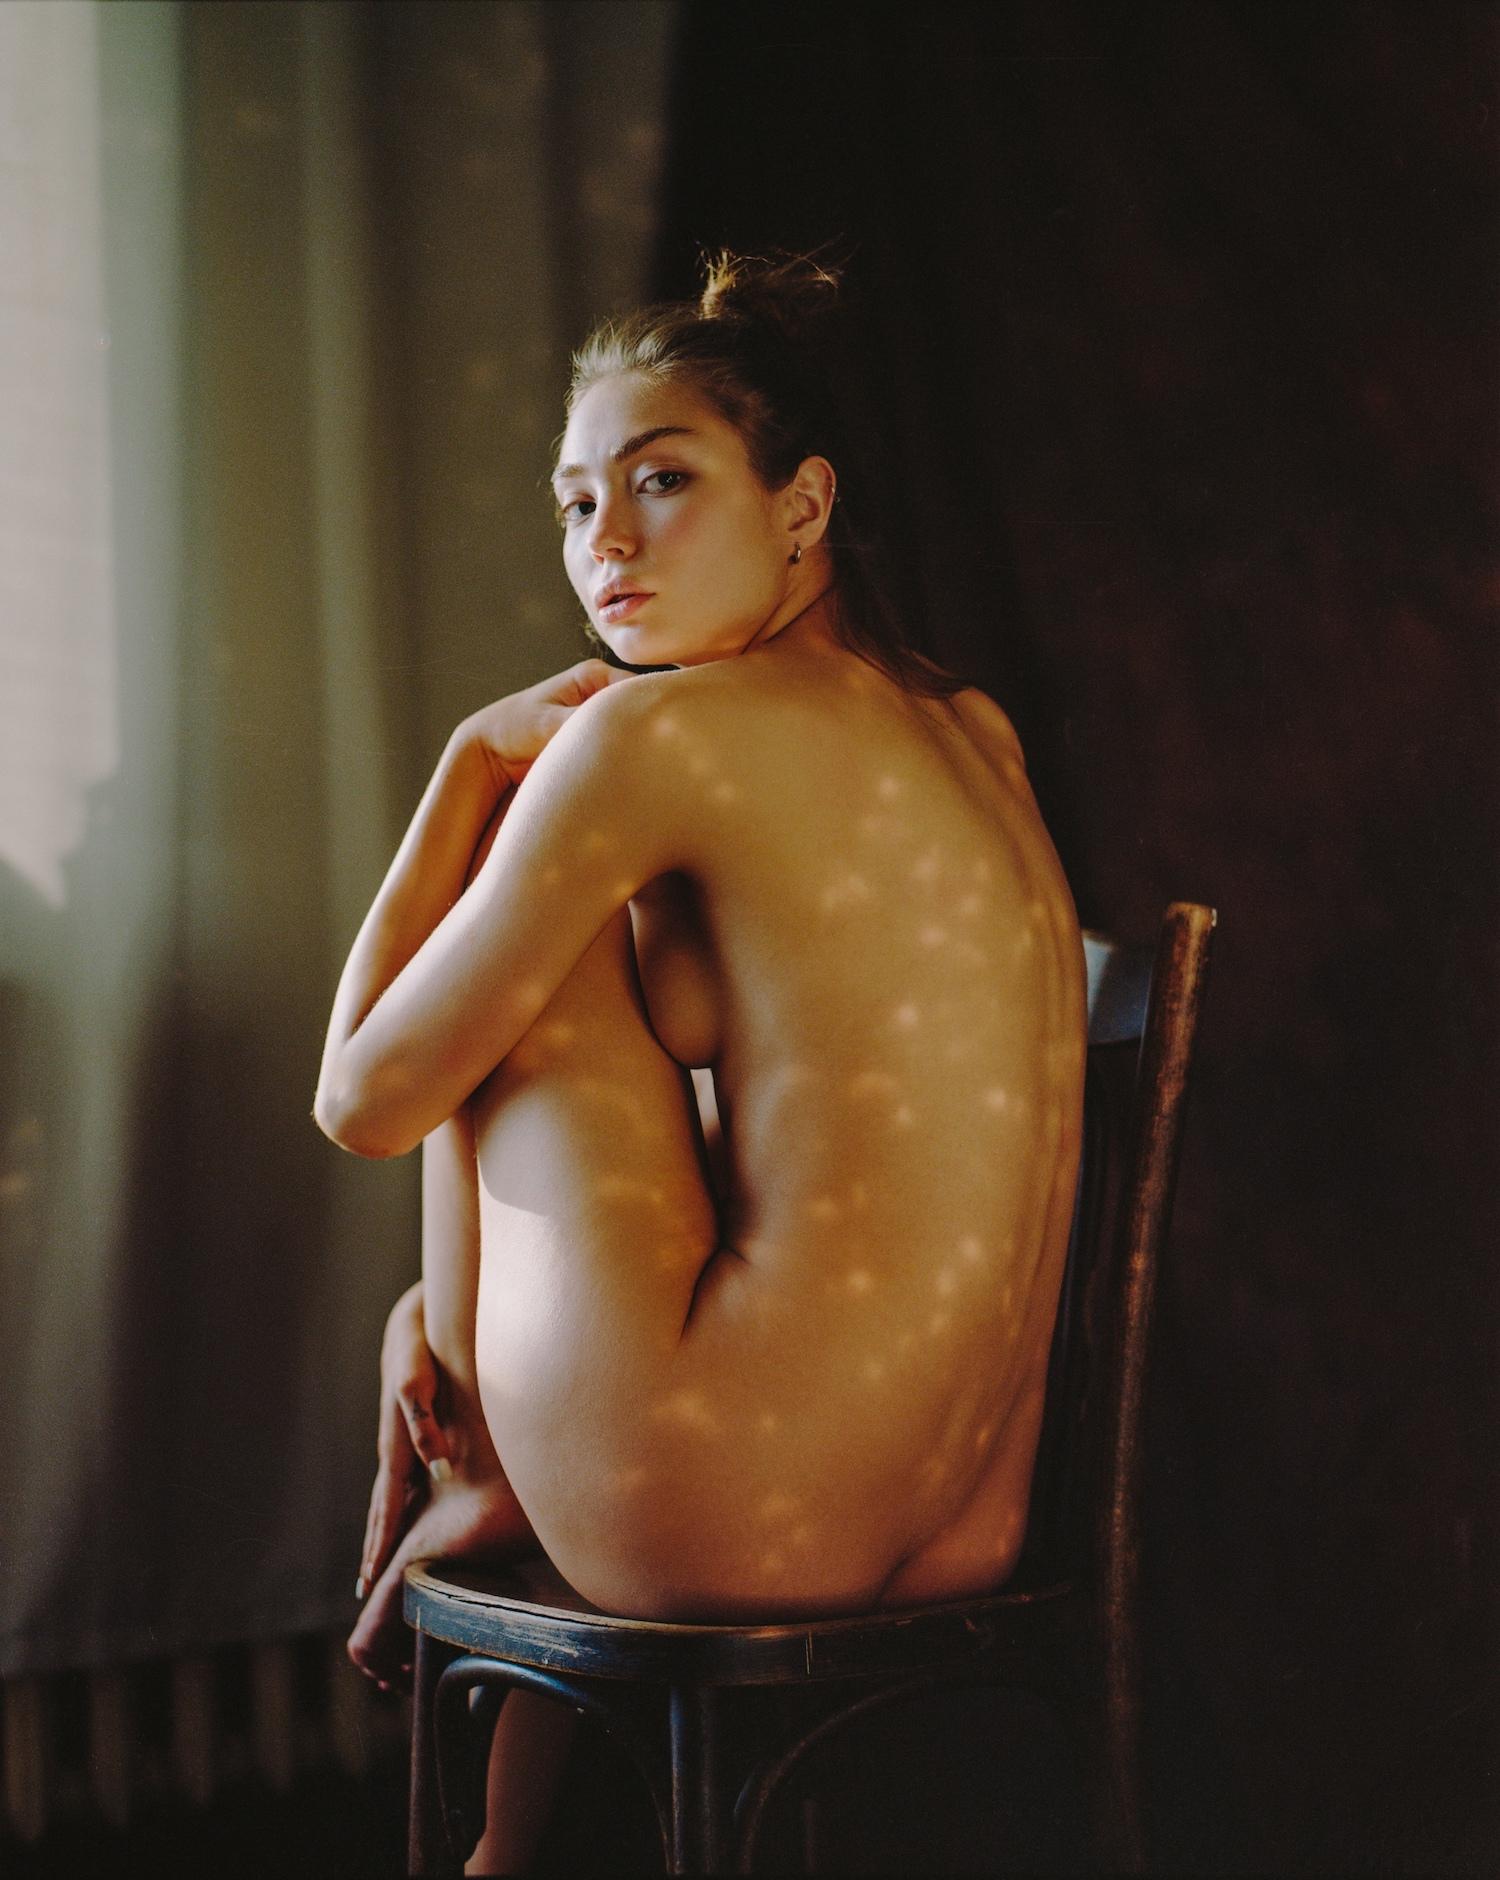 Ekaterina Kliger by Stanislav Liepa